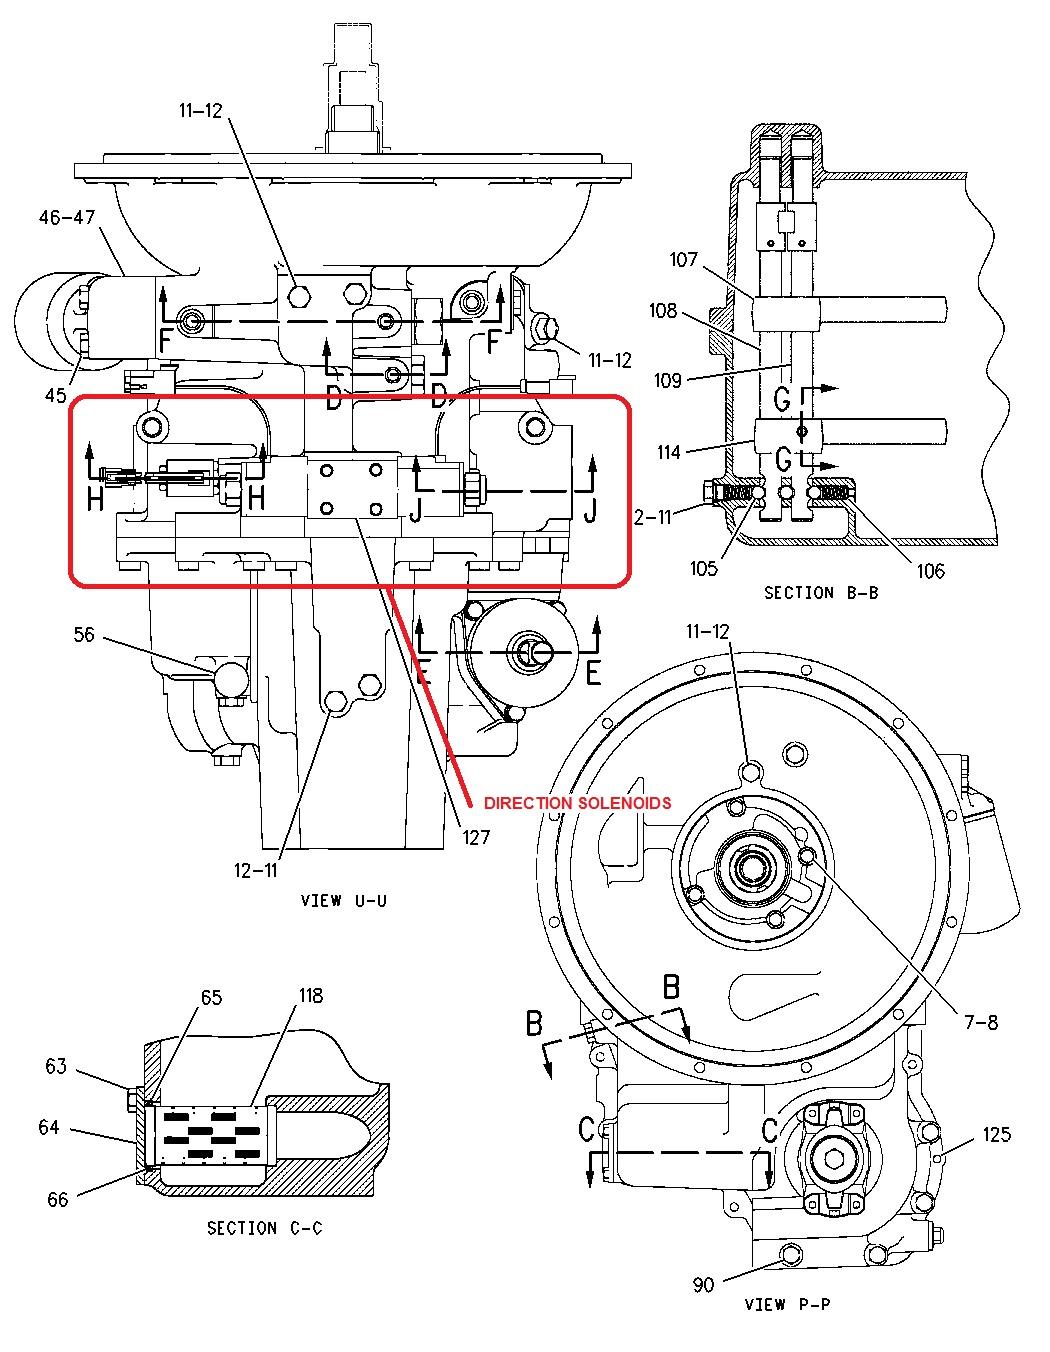 fd4201c8-3fde-40b1-8d28-1afba553042b_420D solenoid top view.jpg